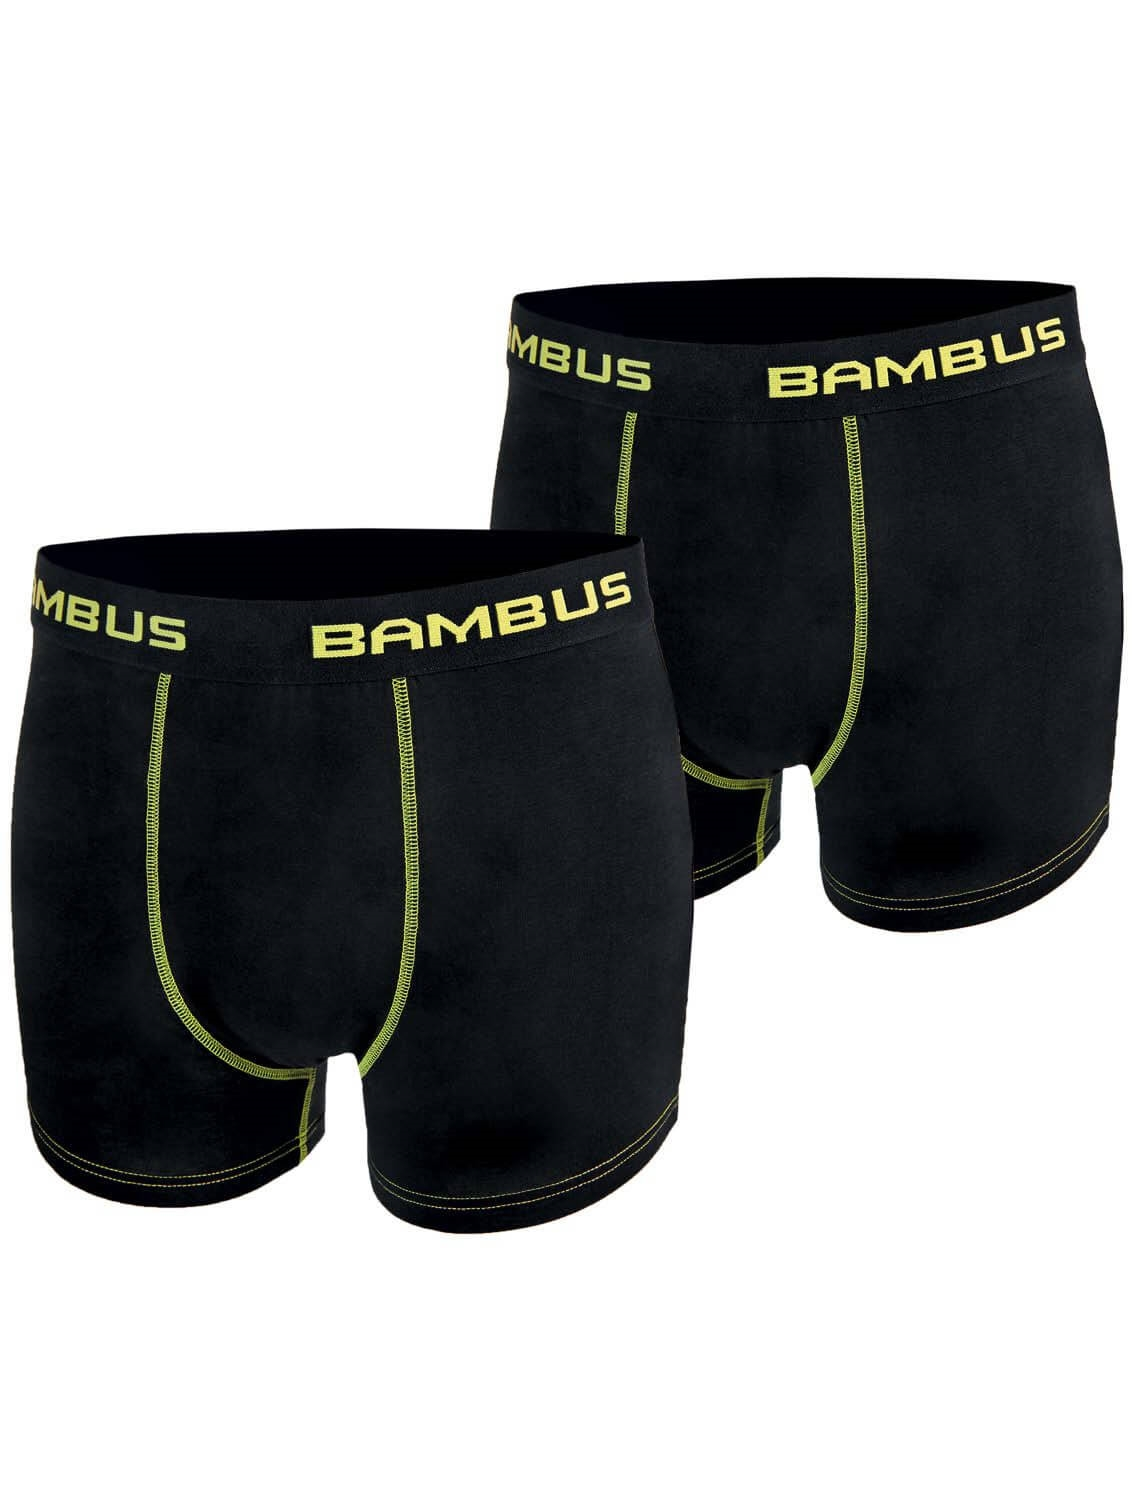 668eb92f918 Boxer Shorts Bambus